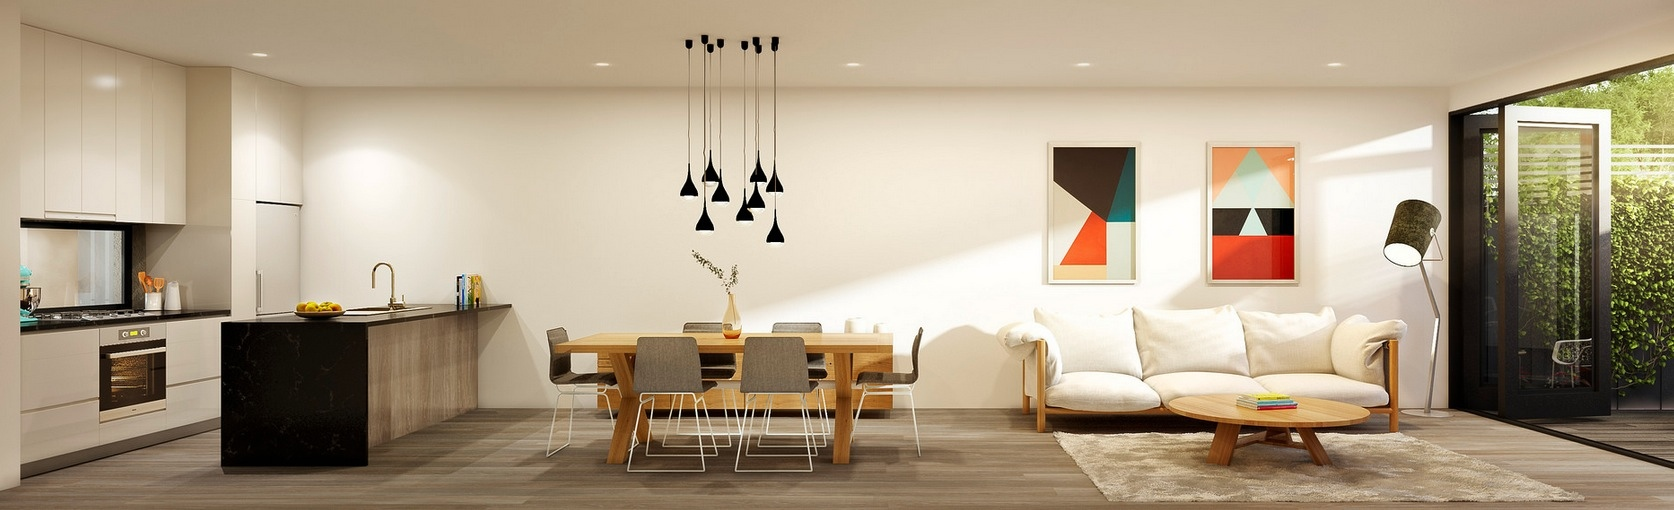 Интерьер дизайнерской квартиры-студии от Lushviz